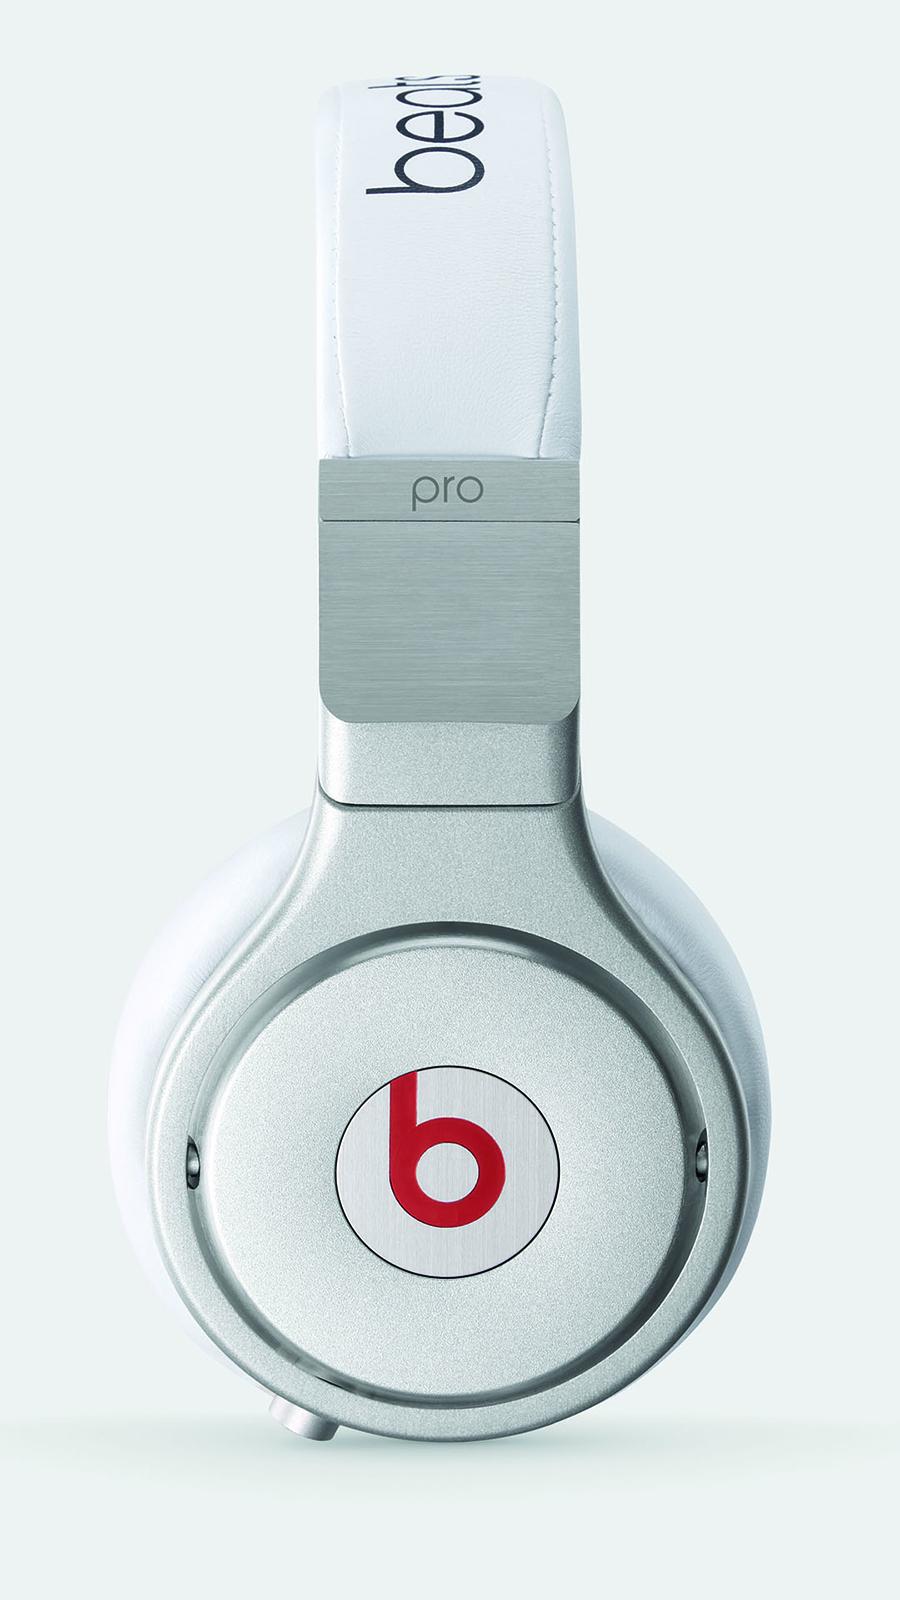 Beats Pro Audio Headphones HD Wallpapers Free Donwload